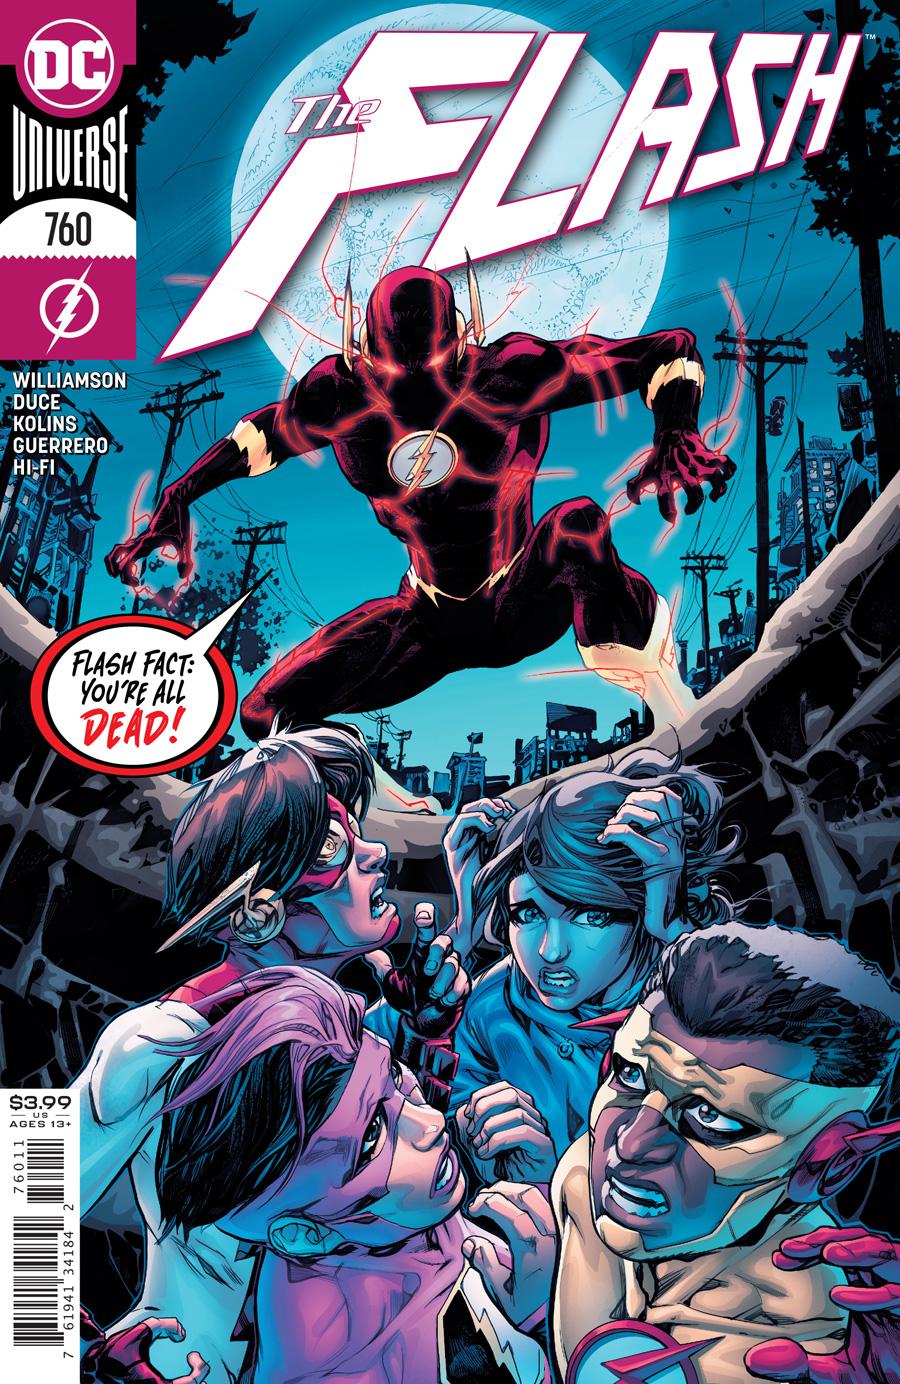 Flash Vol 1 #760 Cover A Howard Porter